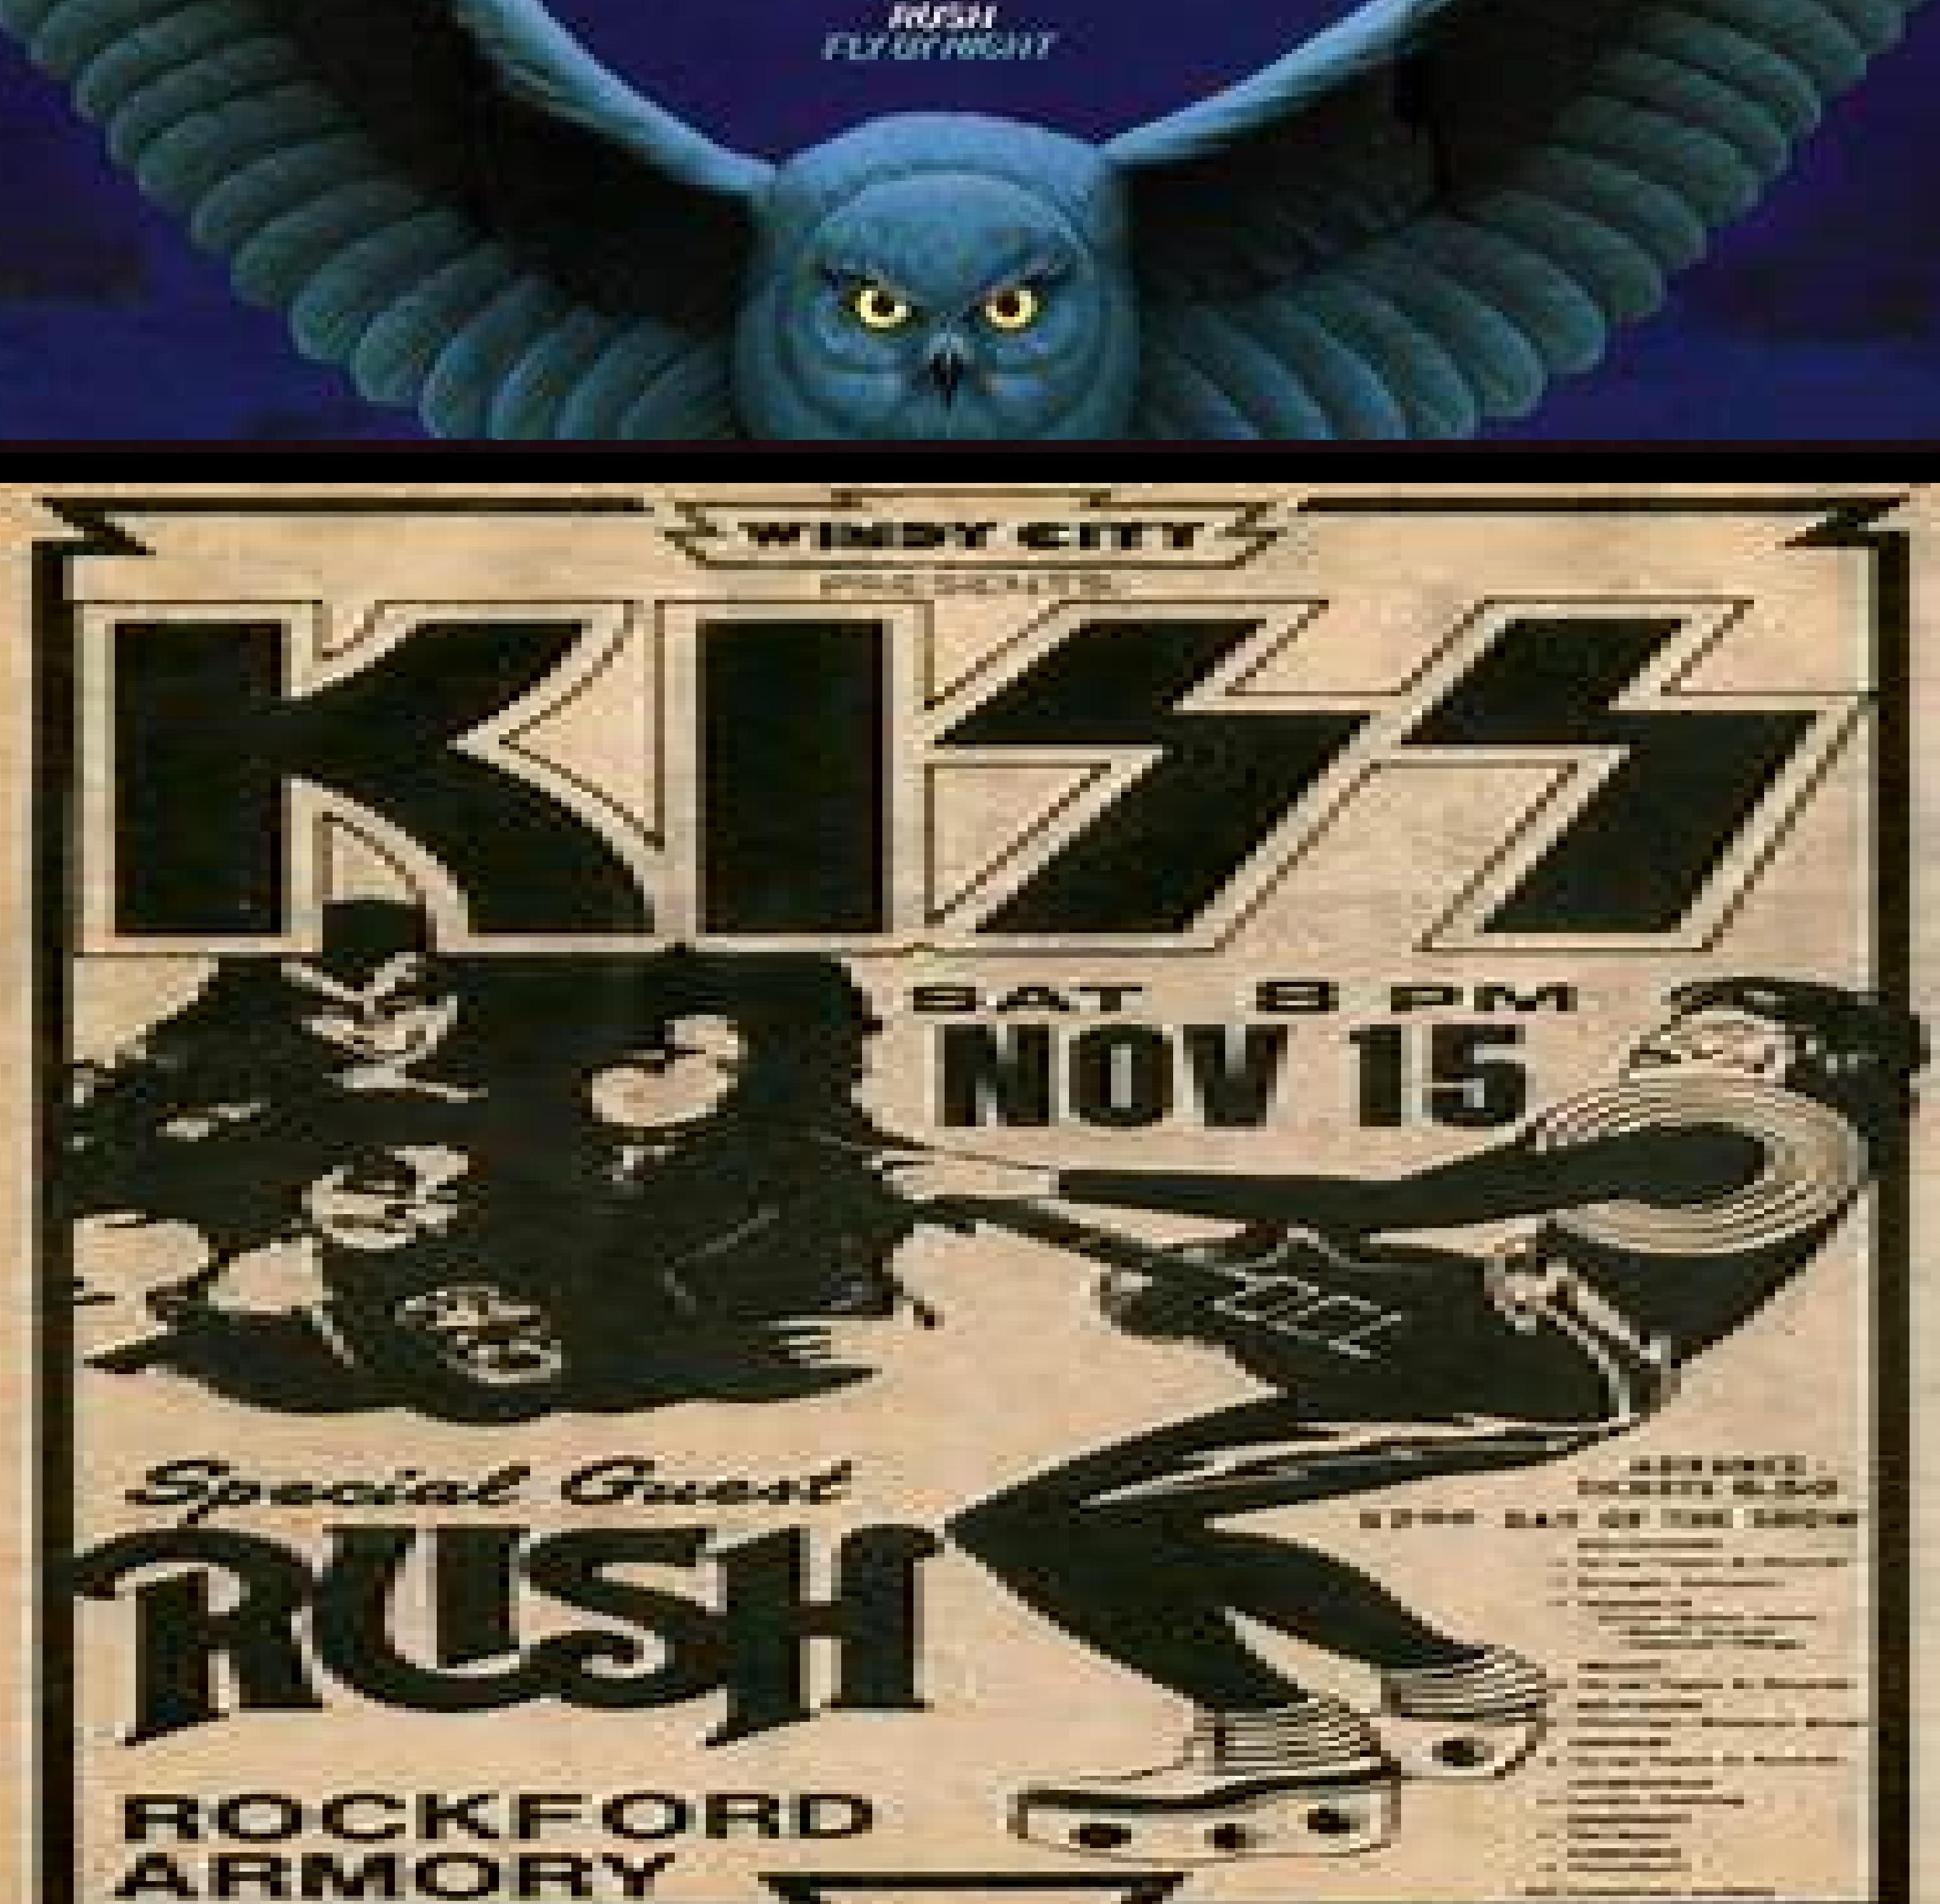 Billboard Year-End Hot 100 singles of 1975 - Wikipedia